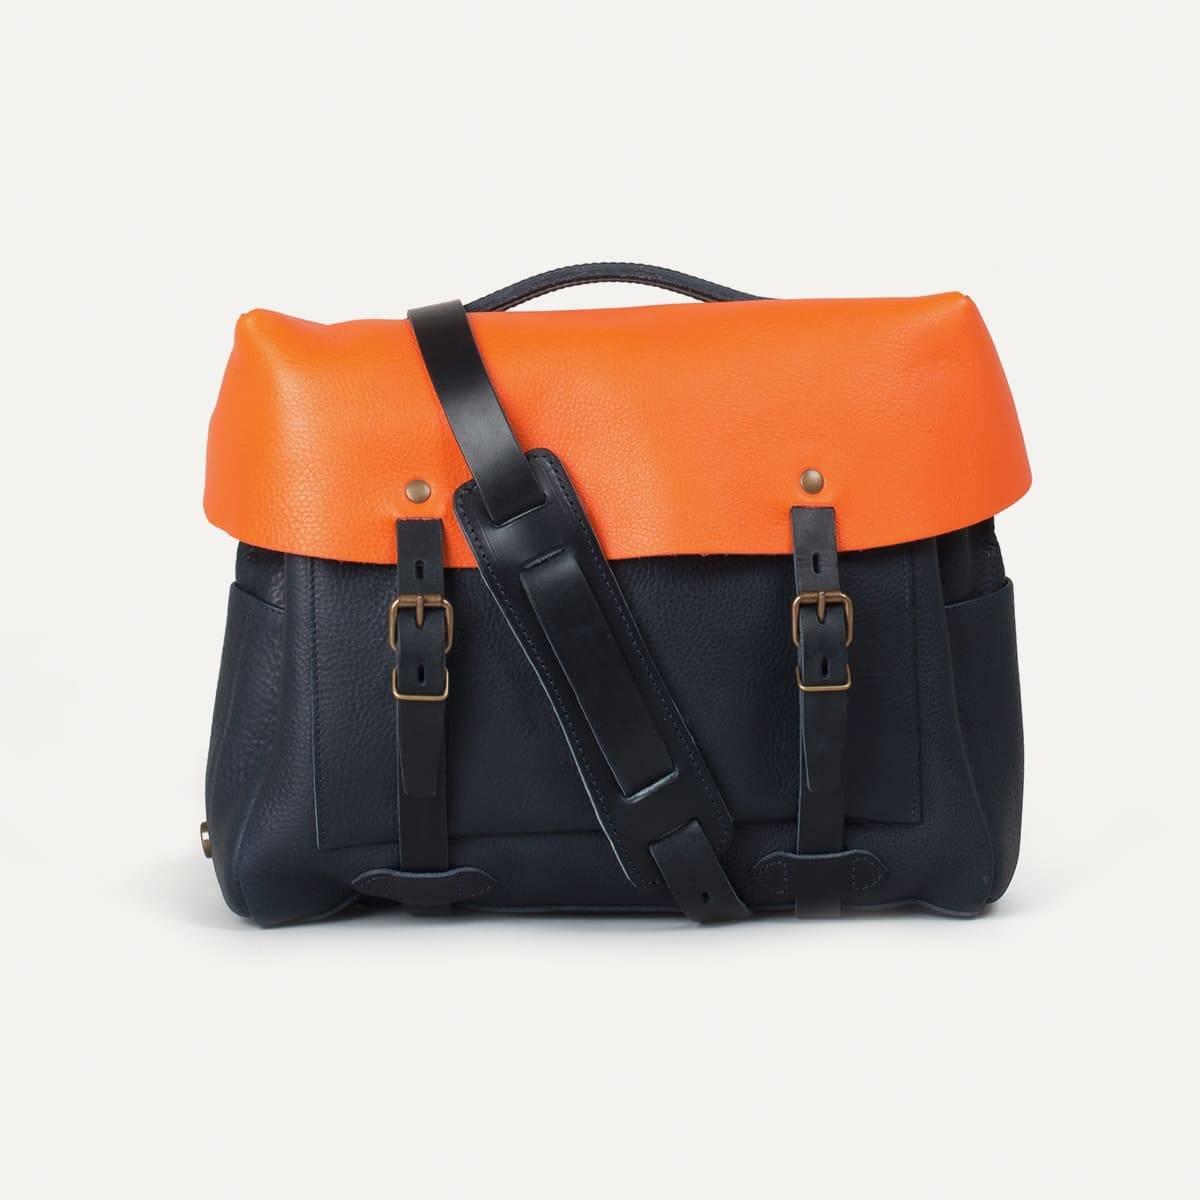 Bleu de Chauffe x Blitz Eclair bag - Navy/Orange (image n°1)